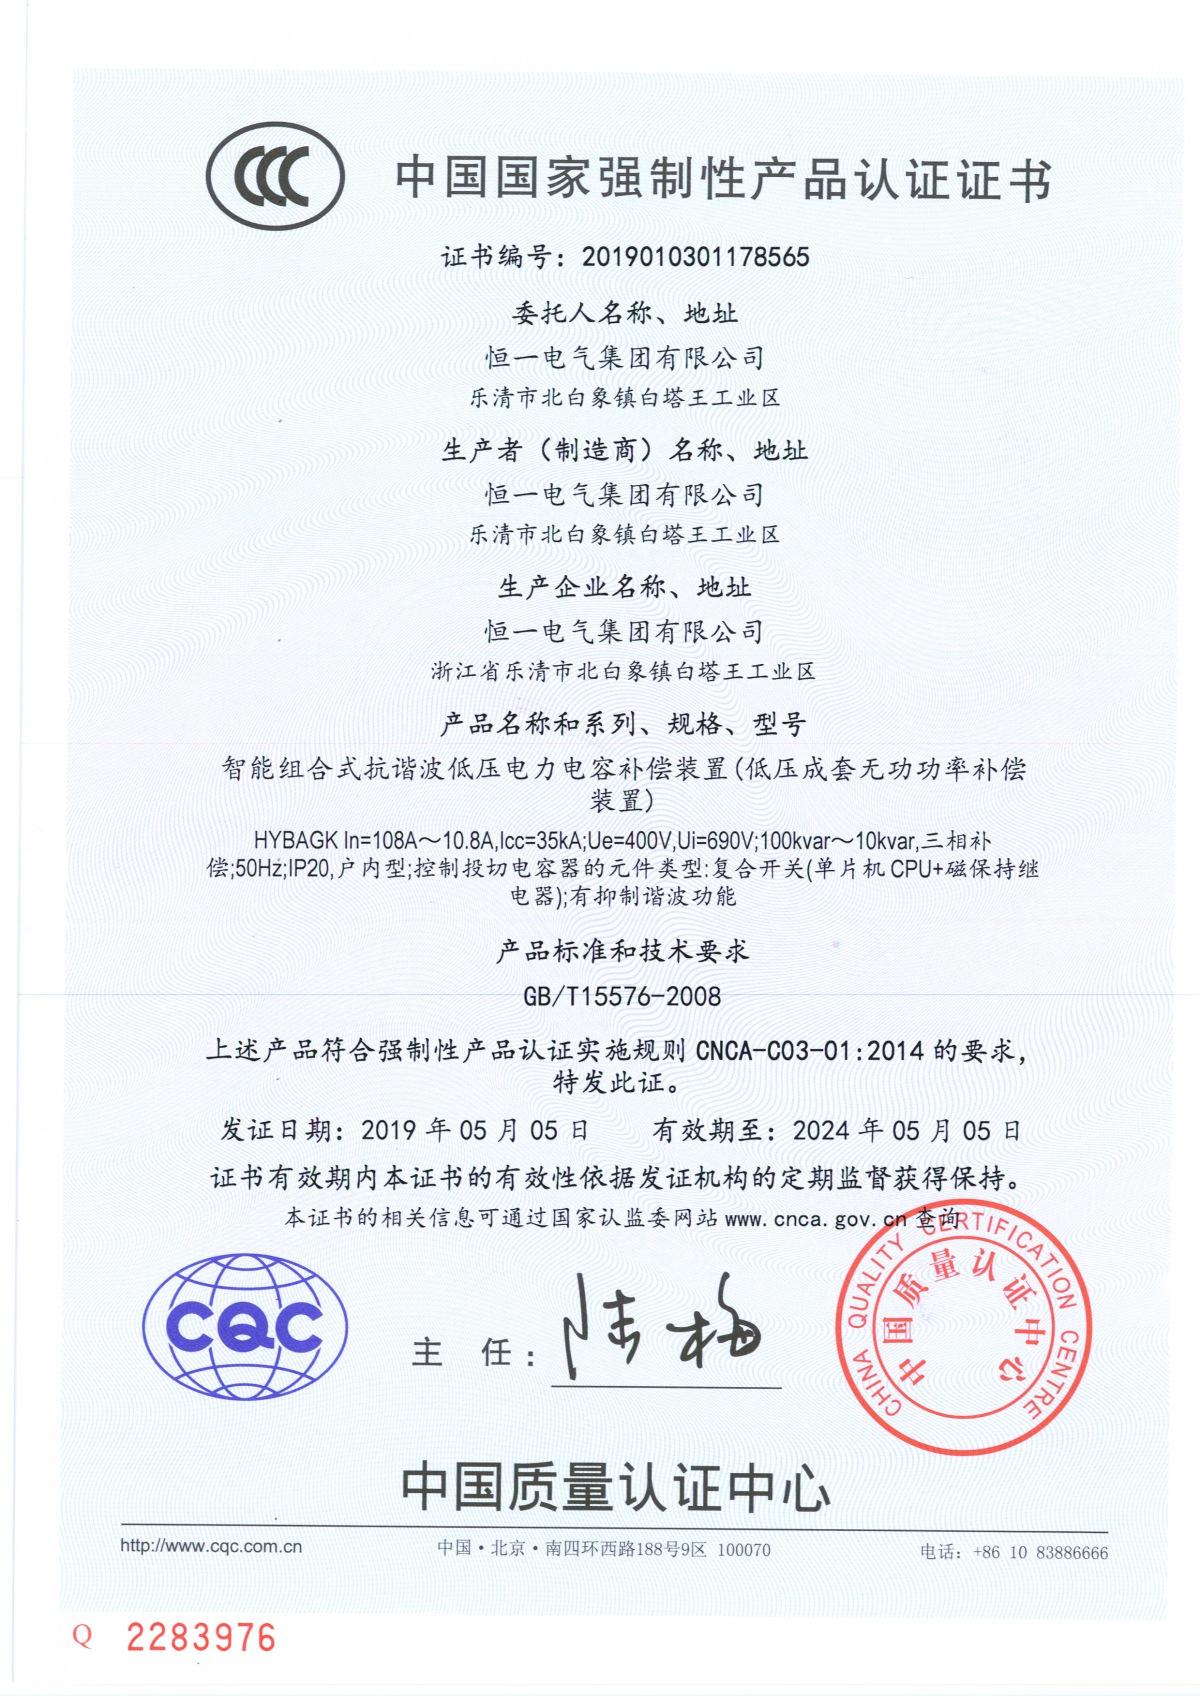 HYBAGK 35Ka 中文